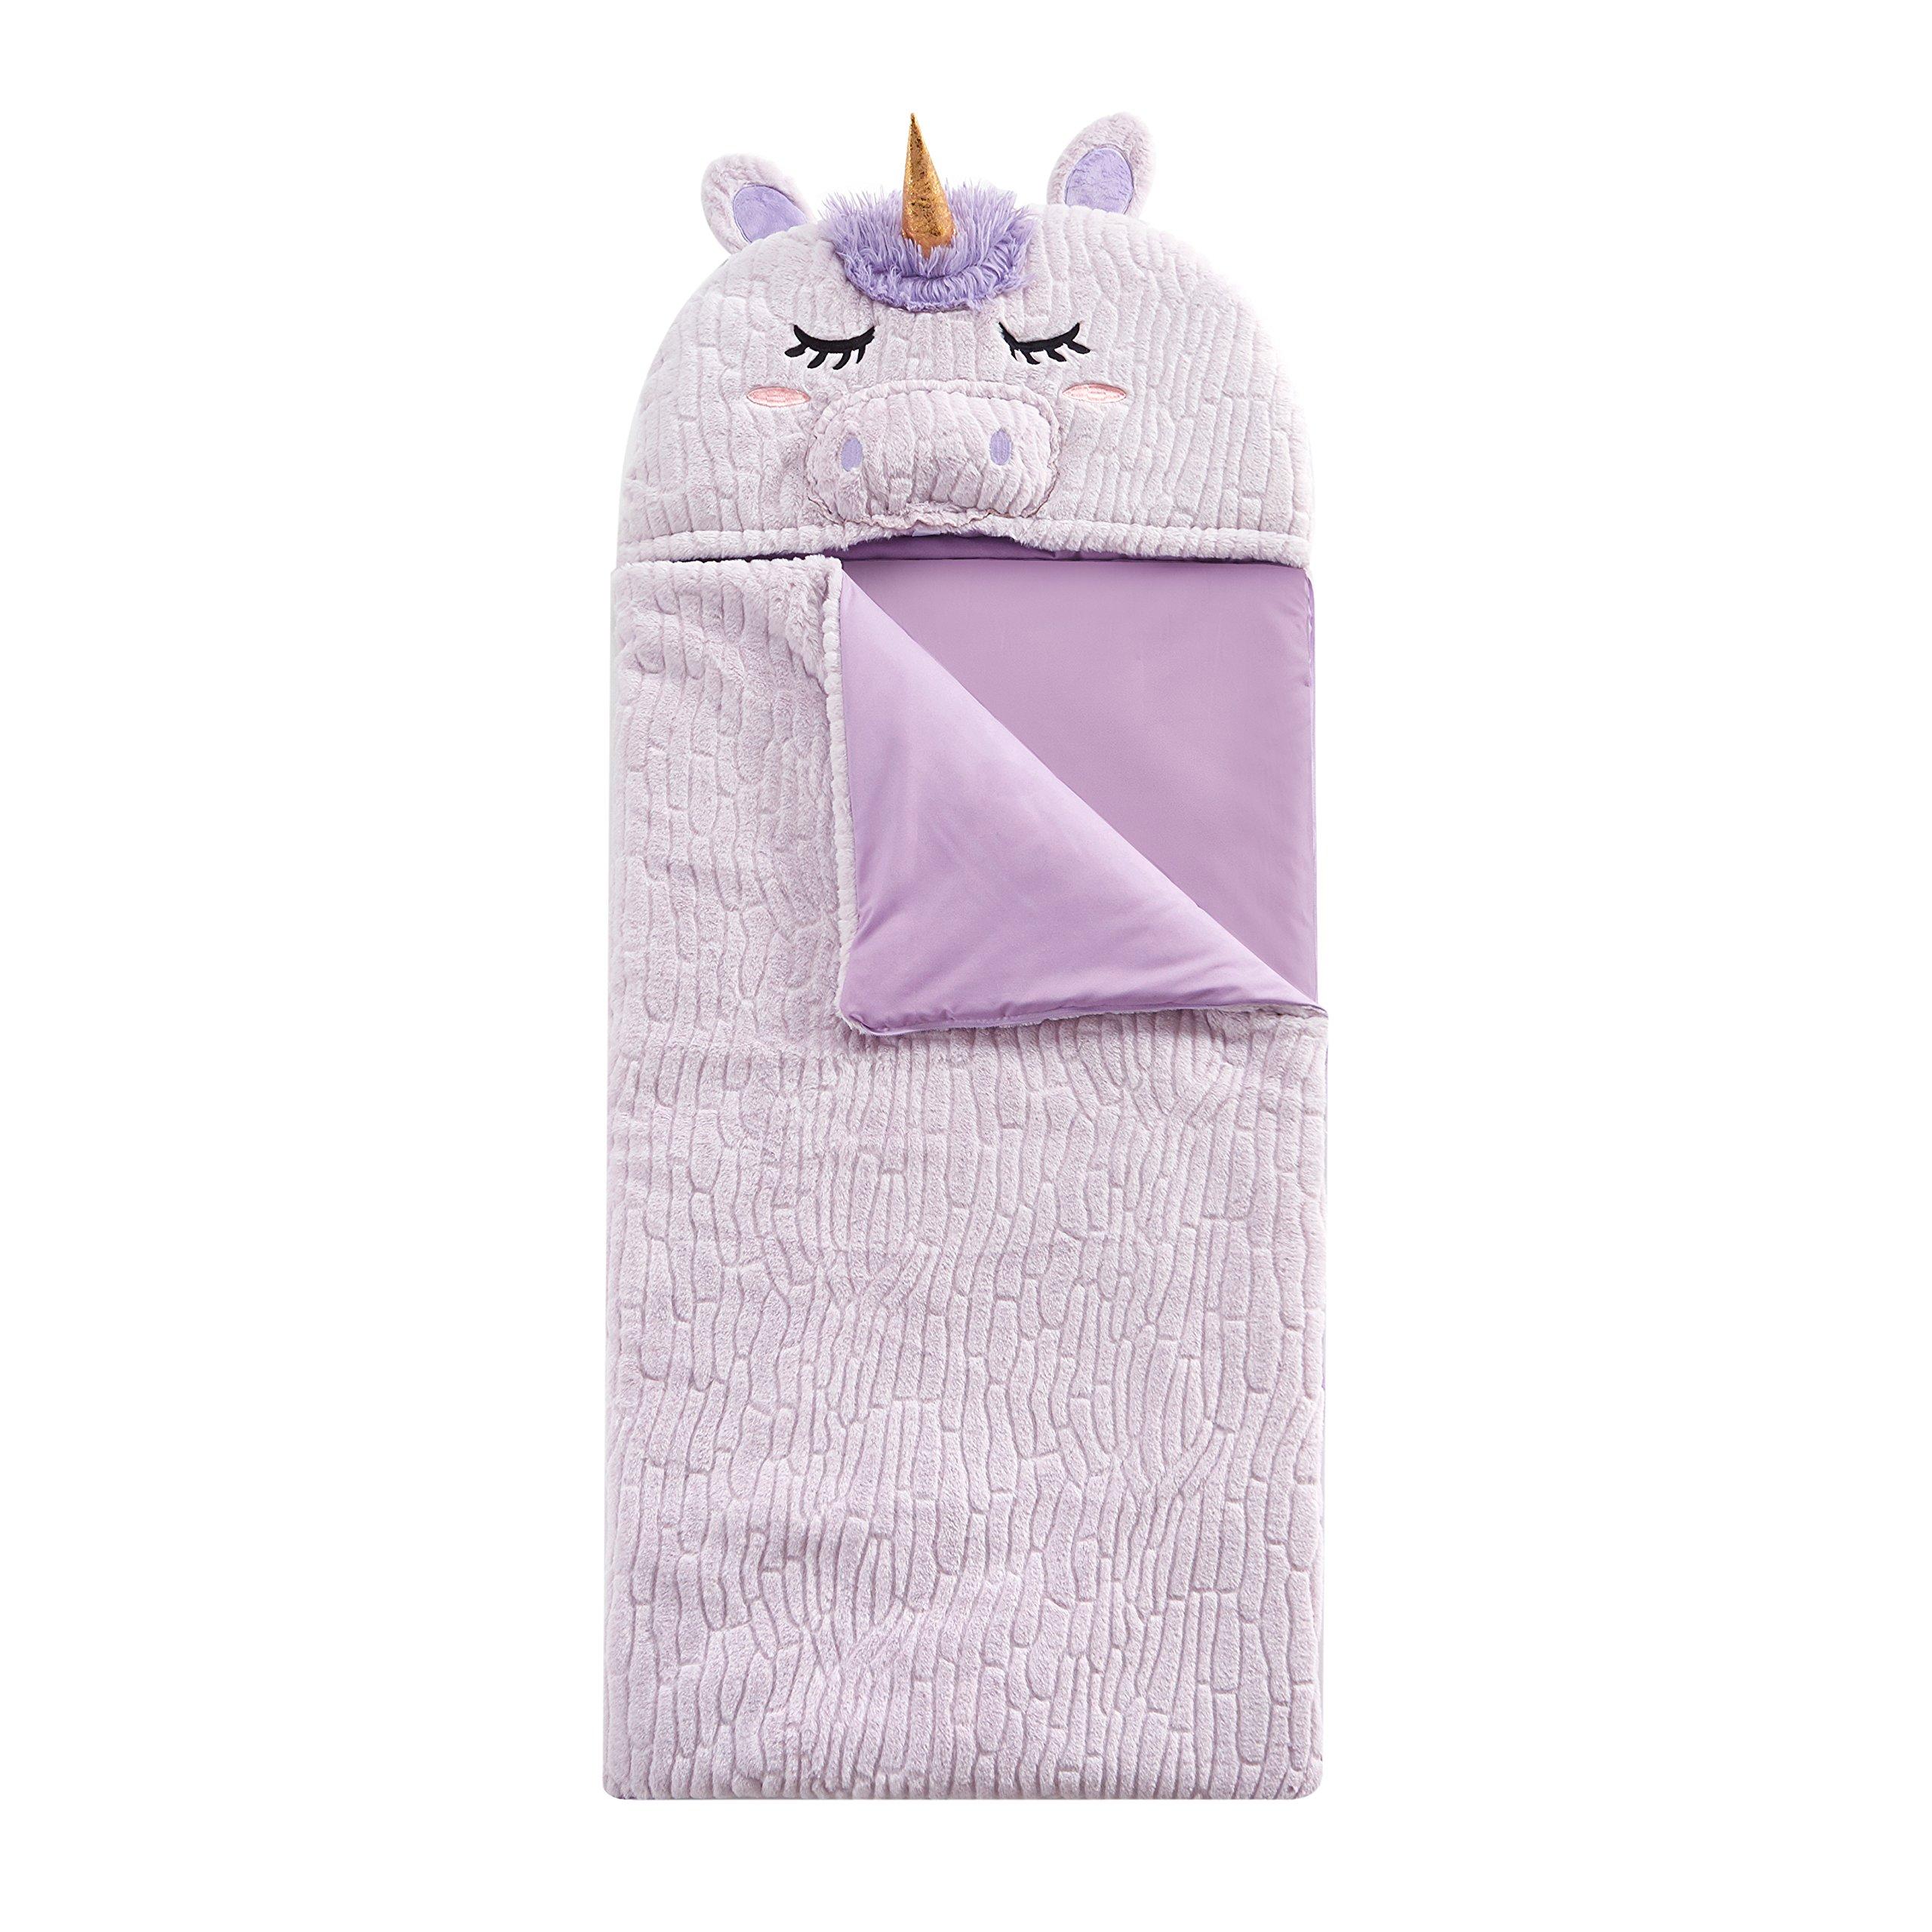 Heritage Kids Unicorn Sleeping Bag, Purple, Pink, 26x60